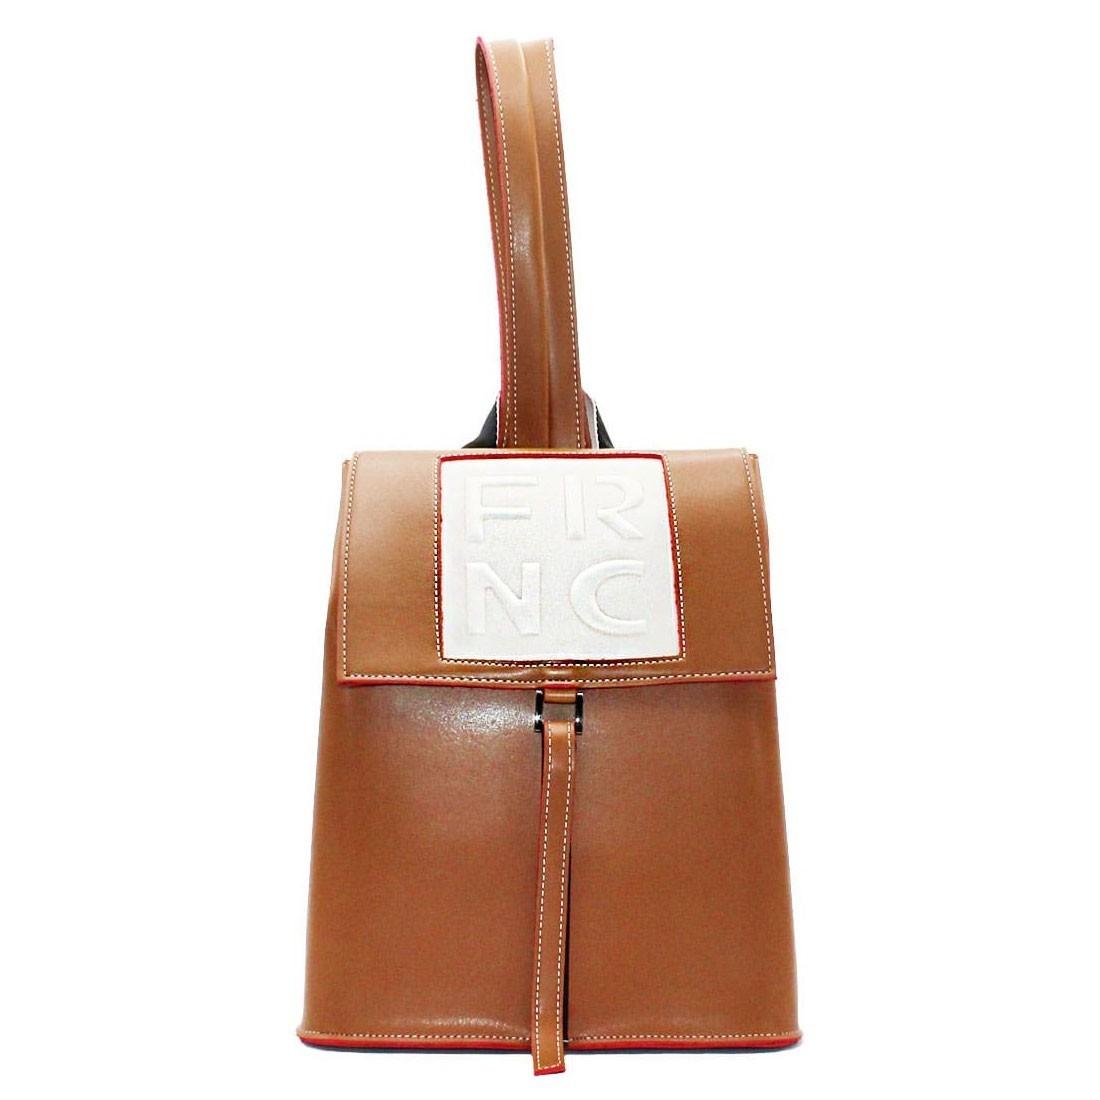 832121f442 FRNC FRANCESCO Τσάντα Γυναικεία Πλάτης-Backpack 1025 Ταμπά ...